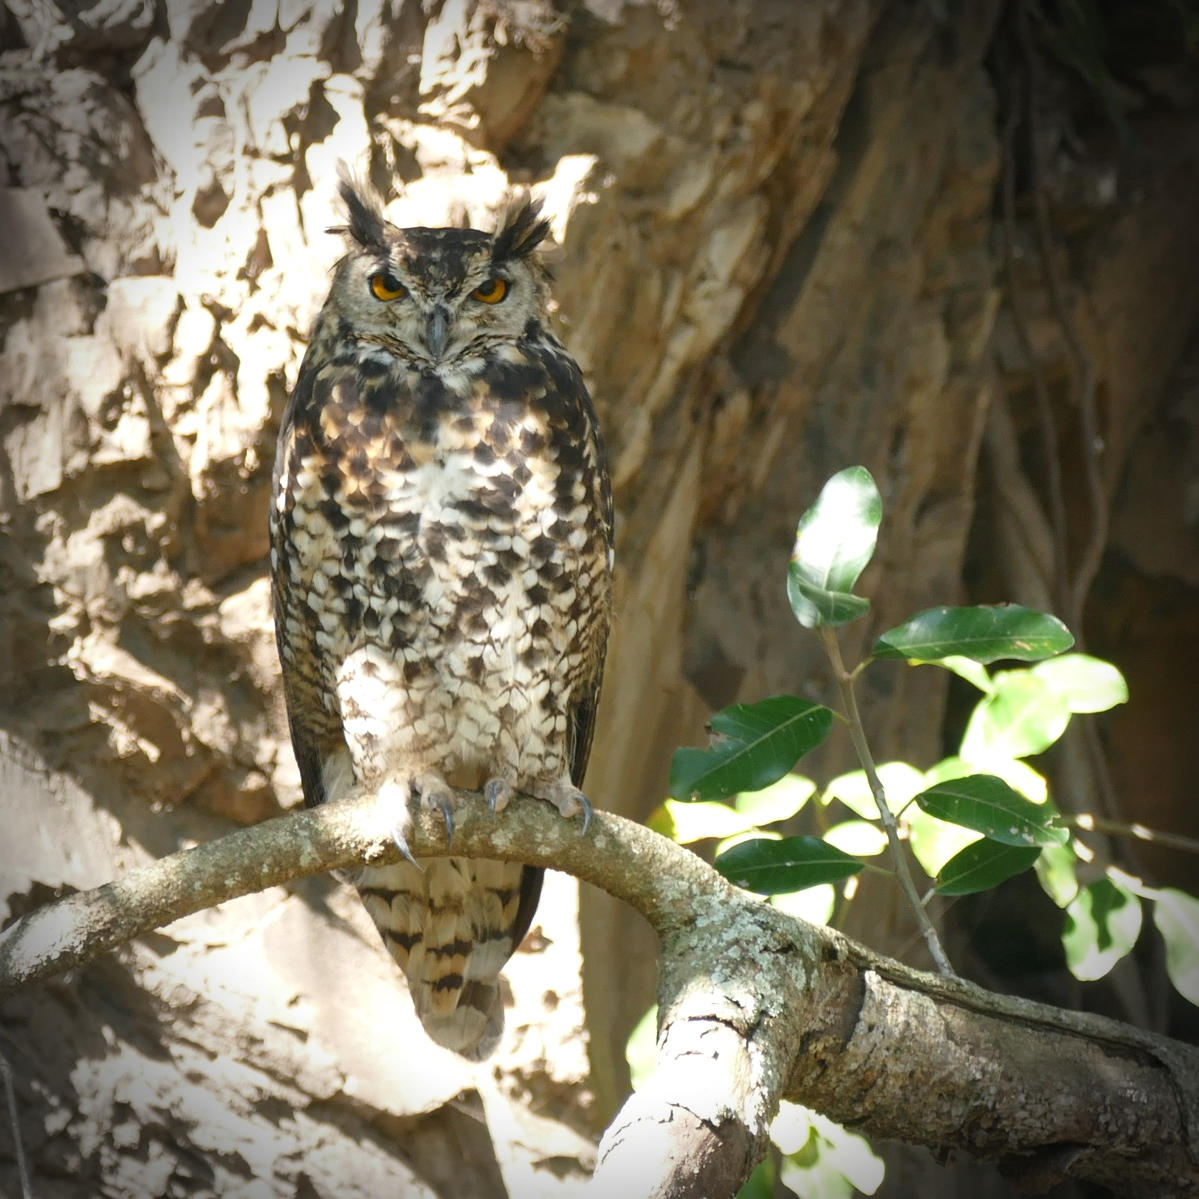 Noah's view of a Cape Eagle-Owl -- a good omen!. Noah's view of a Cape Eagle-Owl -- a good omen! Noah Strycker